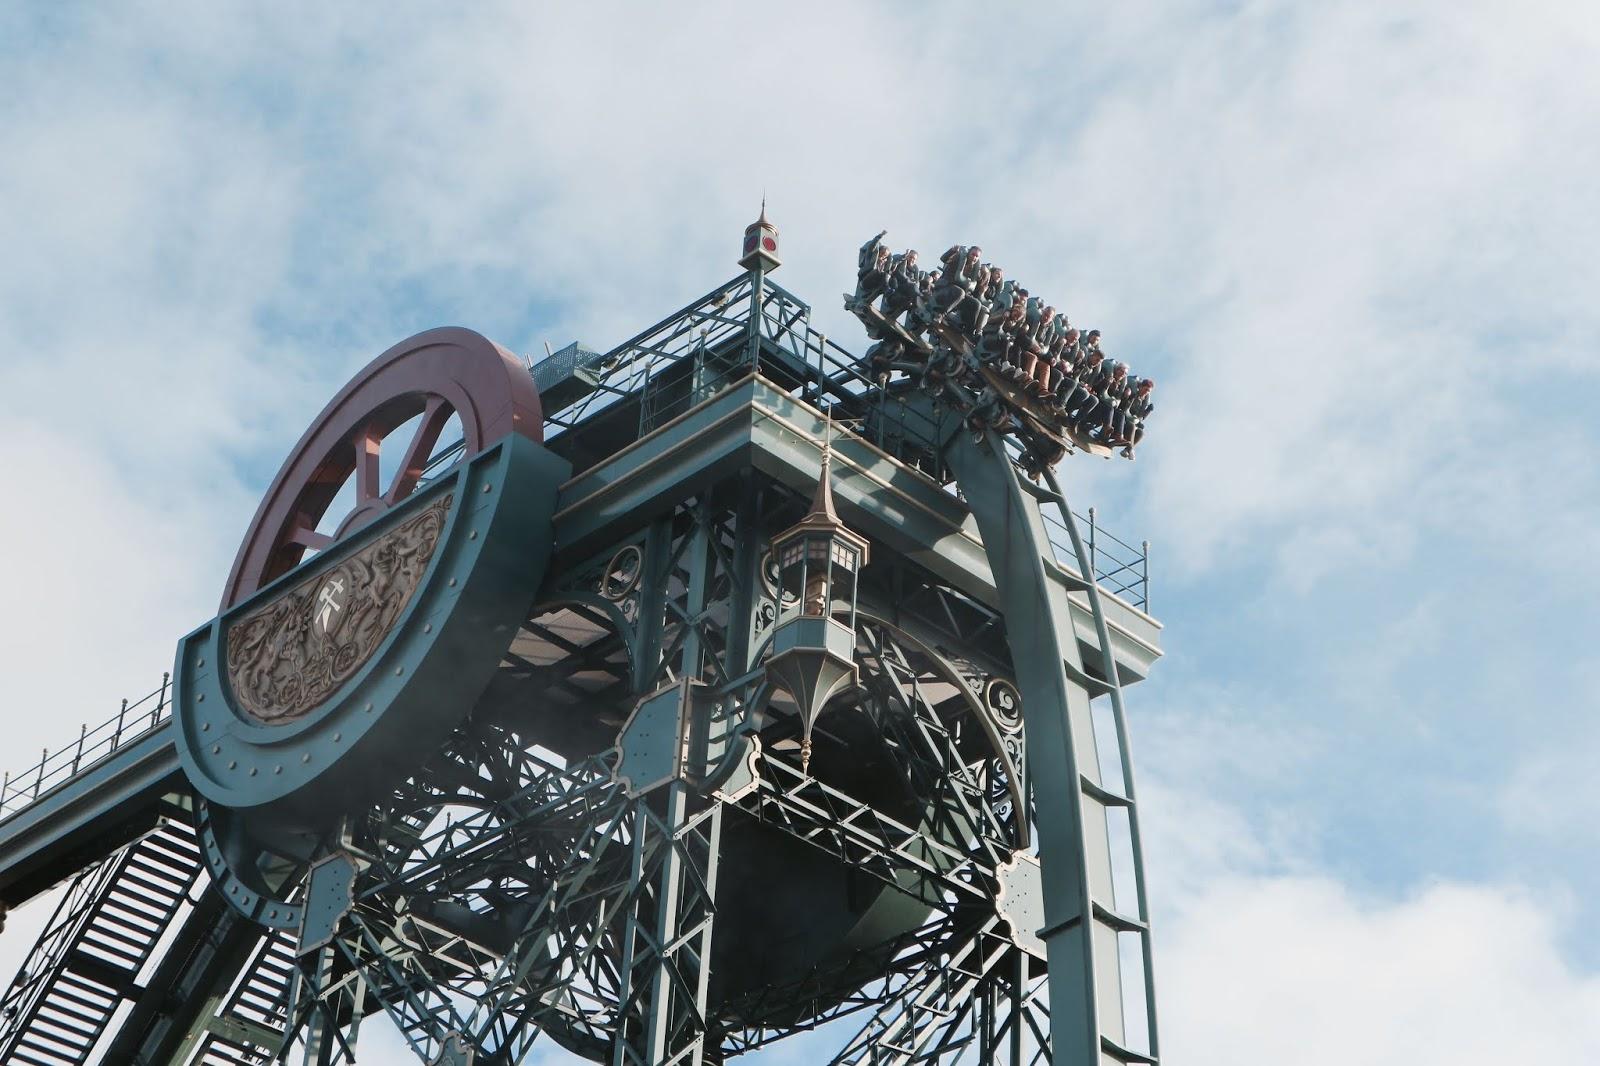 Image Baron 1898 European Theme Park Rollercoaster